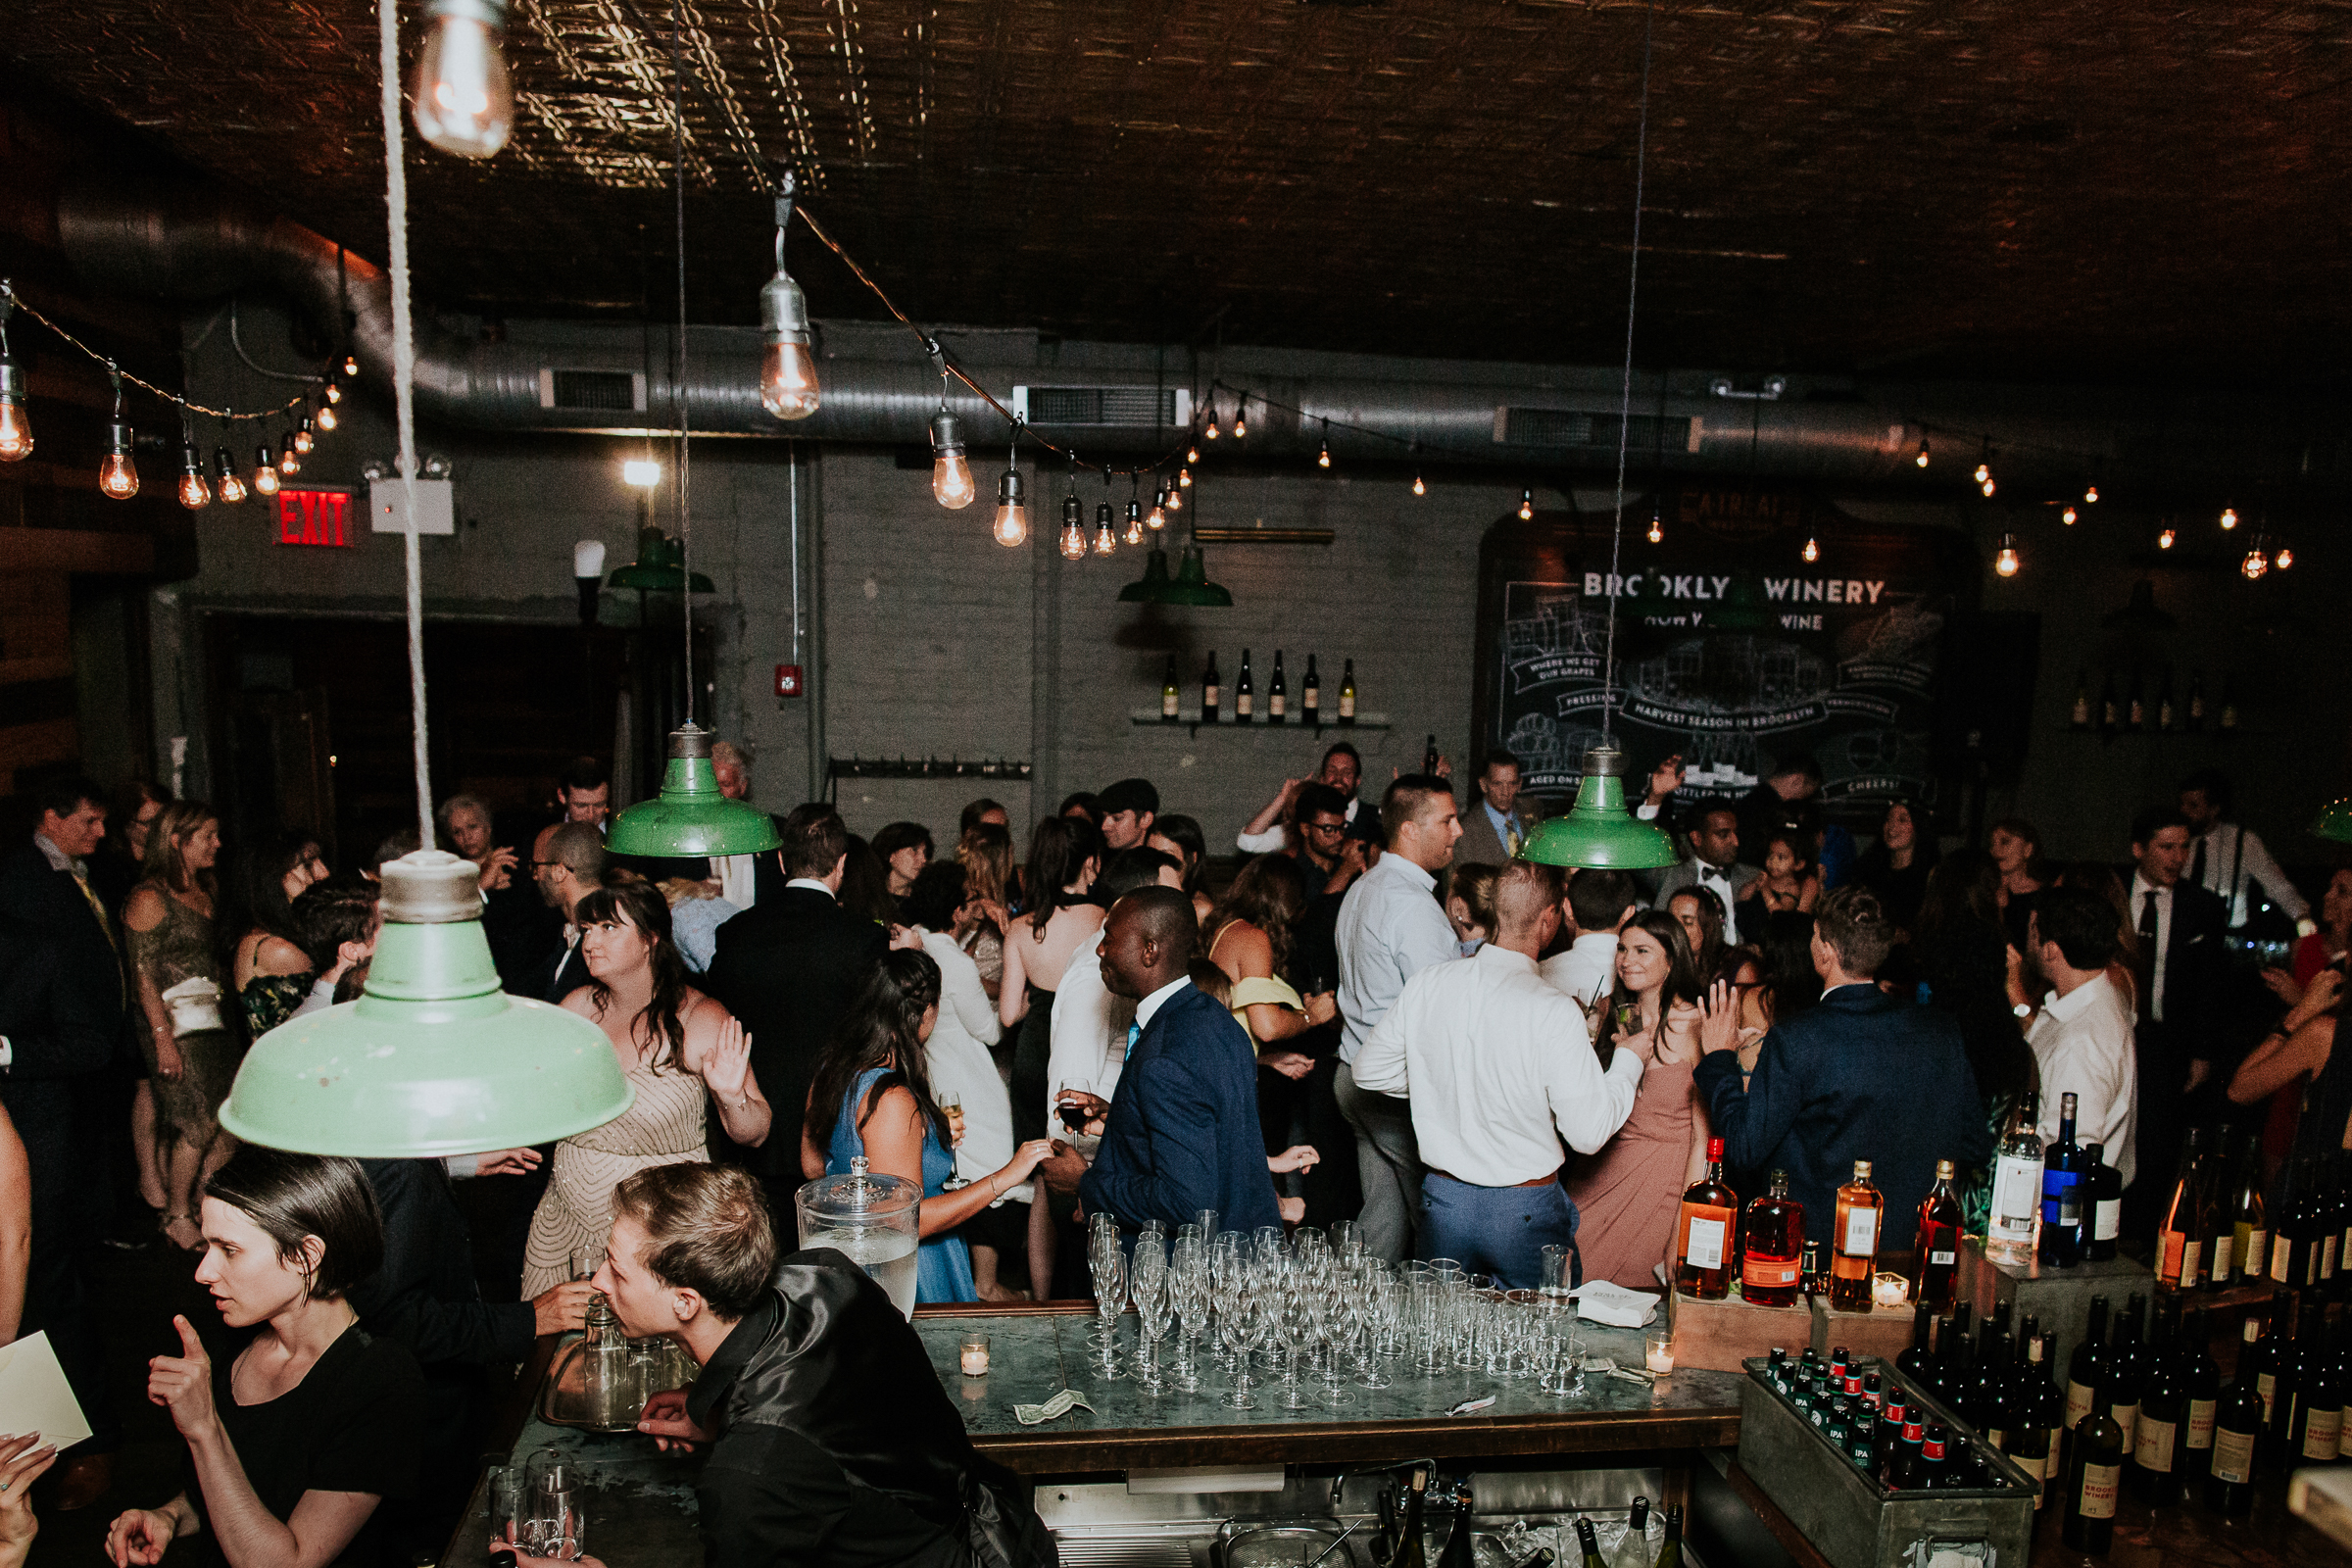 Brooklyn-Winery-NYC-Editorial-Documentary-Wedding-Photographer-Gina-Oli-116.jpg